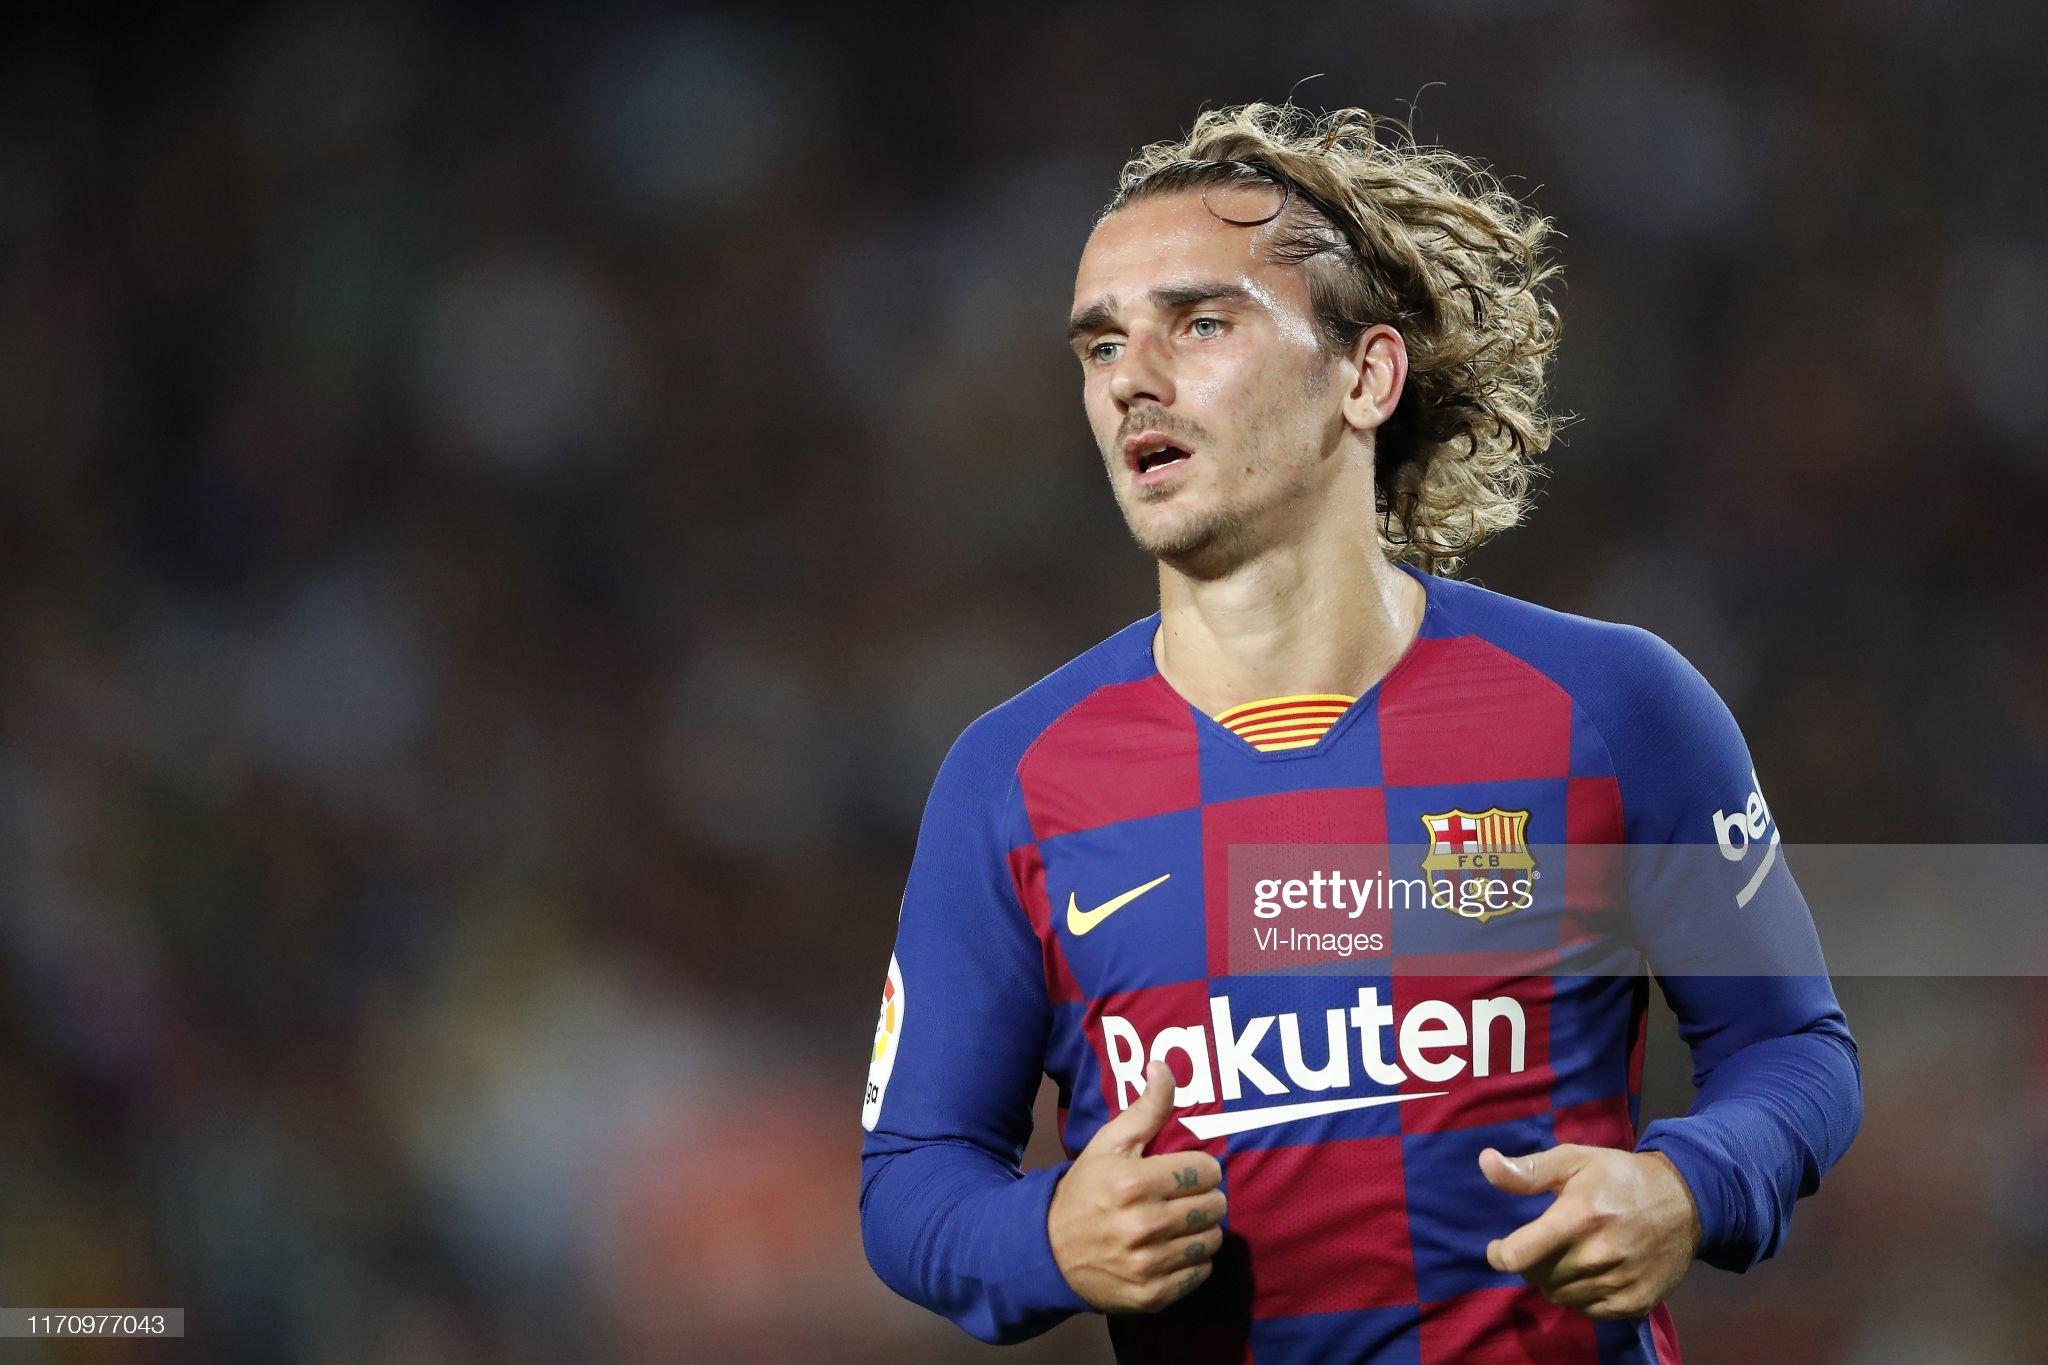 صور مباراة : برشلونة - فياريال 2-1 ( 24-09-2019 )  Antoine-griezmann-of-fc-barcelona-during-the-laliga-santander-match-picture-id1170977043?s=2048x2048